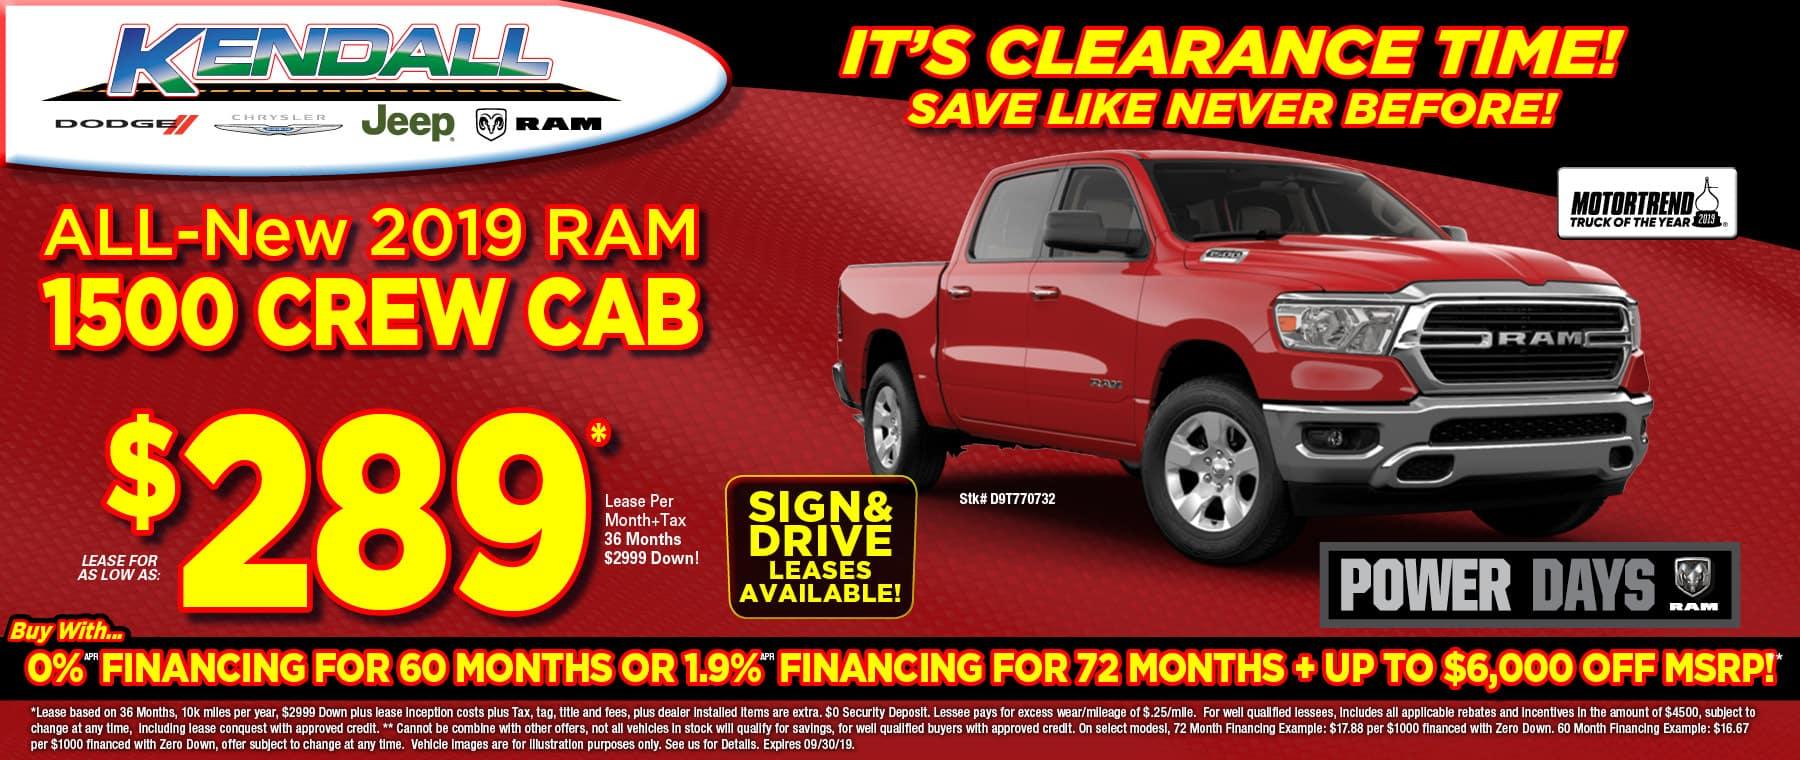 Kendall Dodge Chrysler Jeep Ram | Chrysler, Dodge, Jeep, Ram